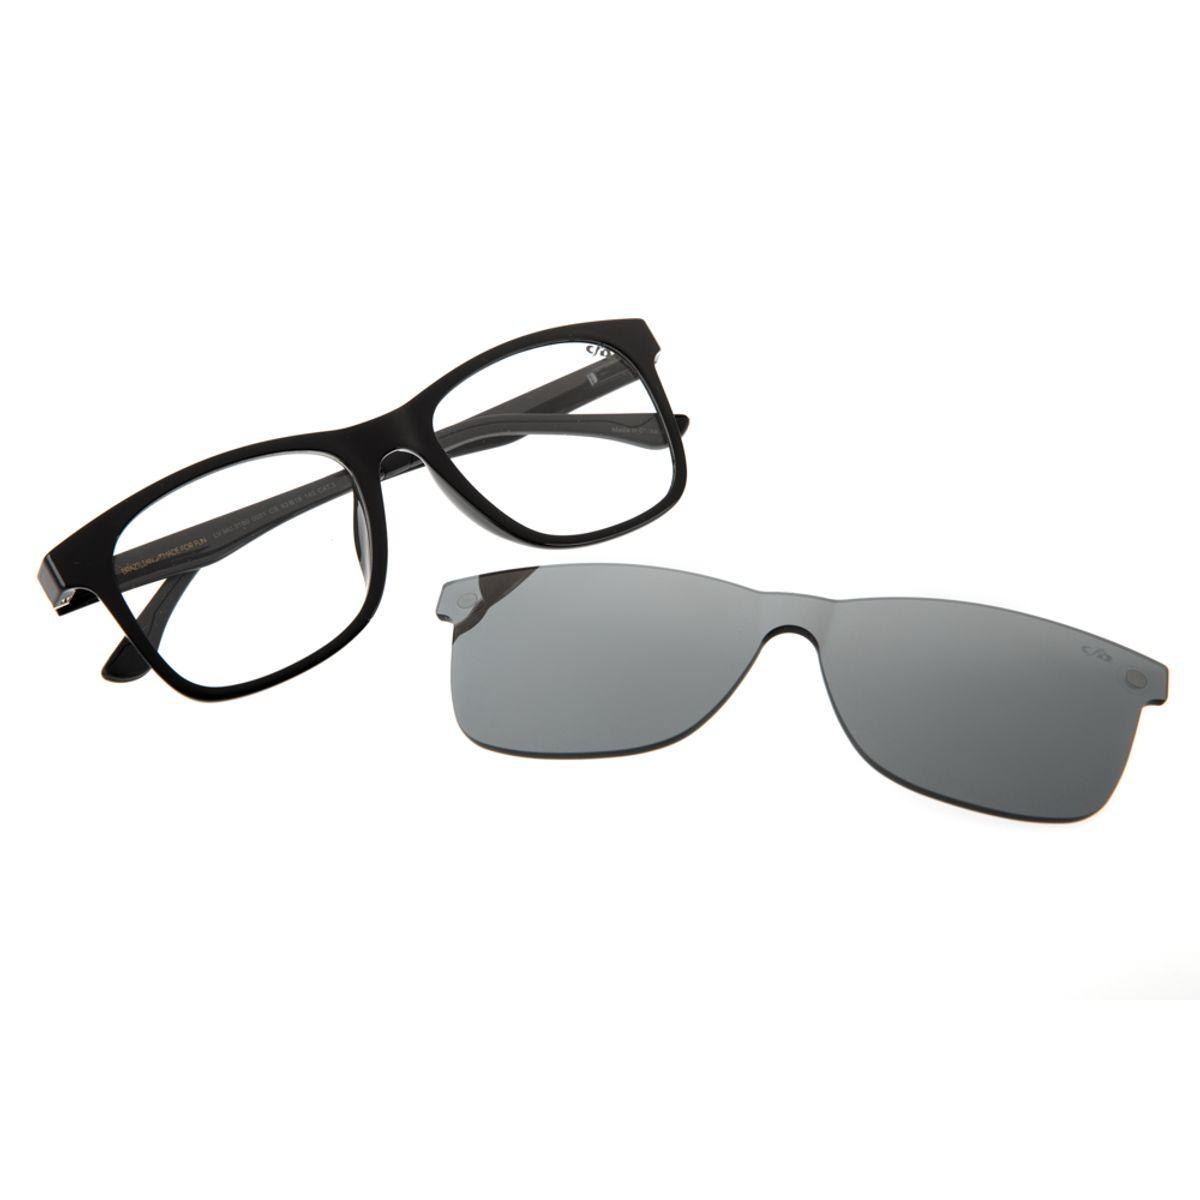 4cebc62b6 Armação para Óculos de Grau Chilli Beans Unissex Multi Clip On Preto -  LV.MU.0180.0001 M. REF: LV.MU.0180.0001. Previous